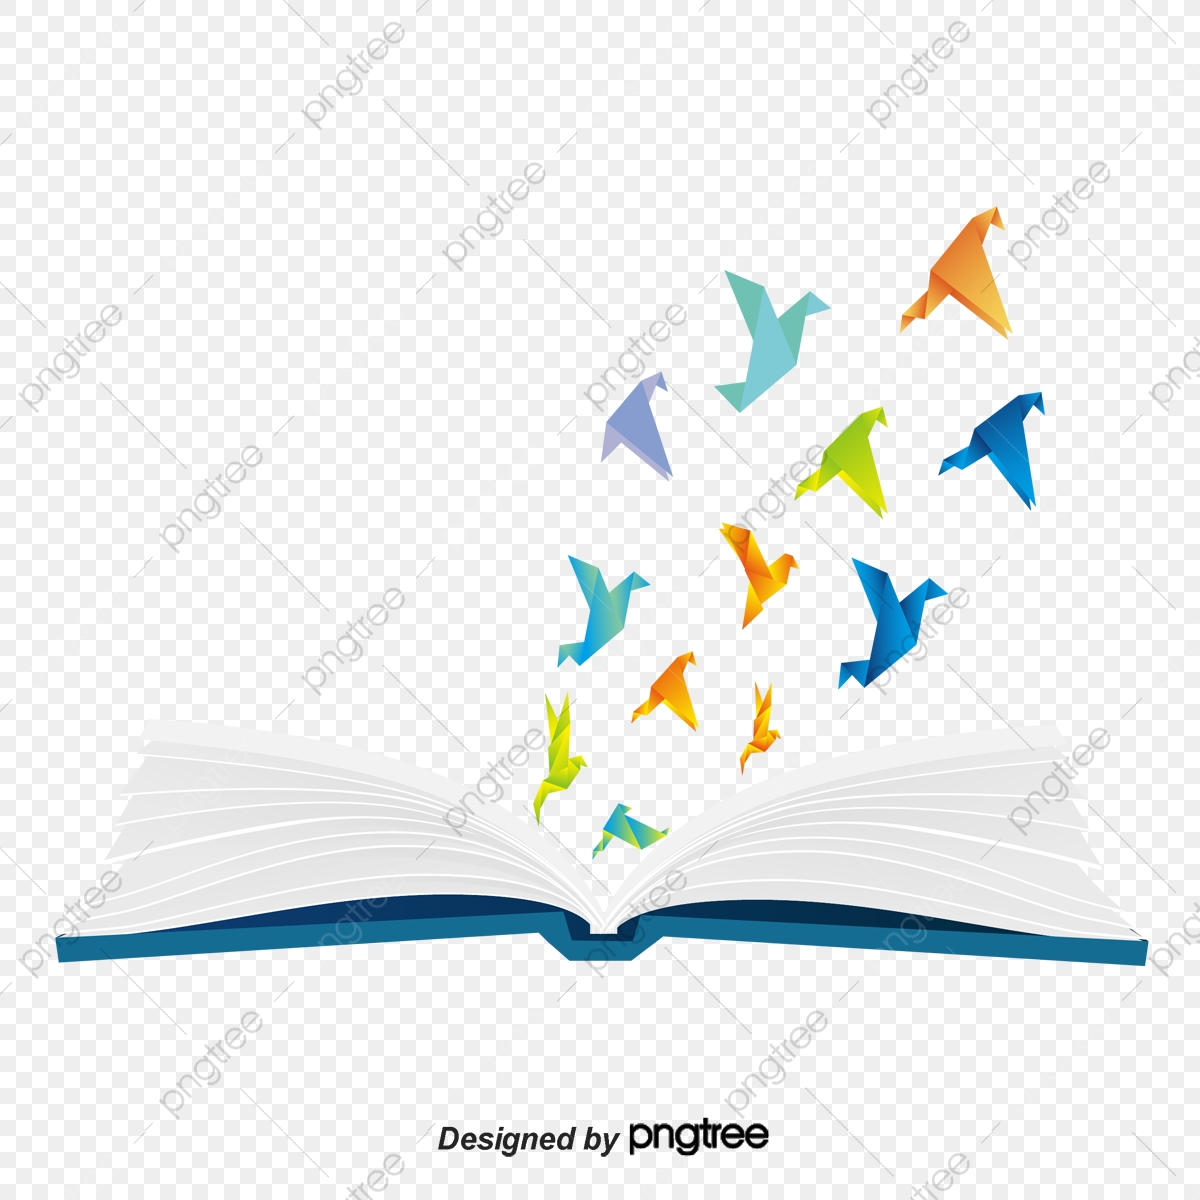 Origami paper books stock photo. Image of artwork, origami - 75236568   1200x1200